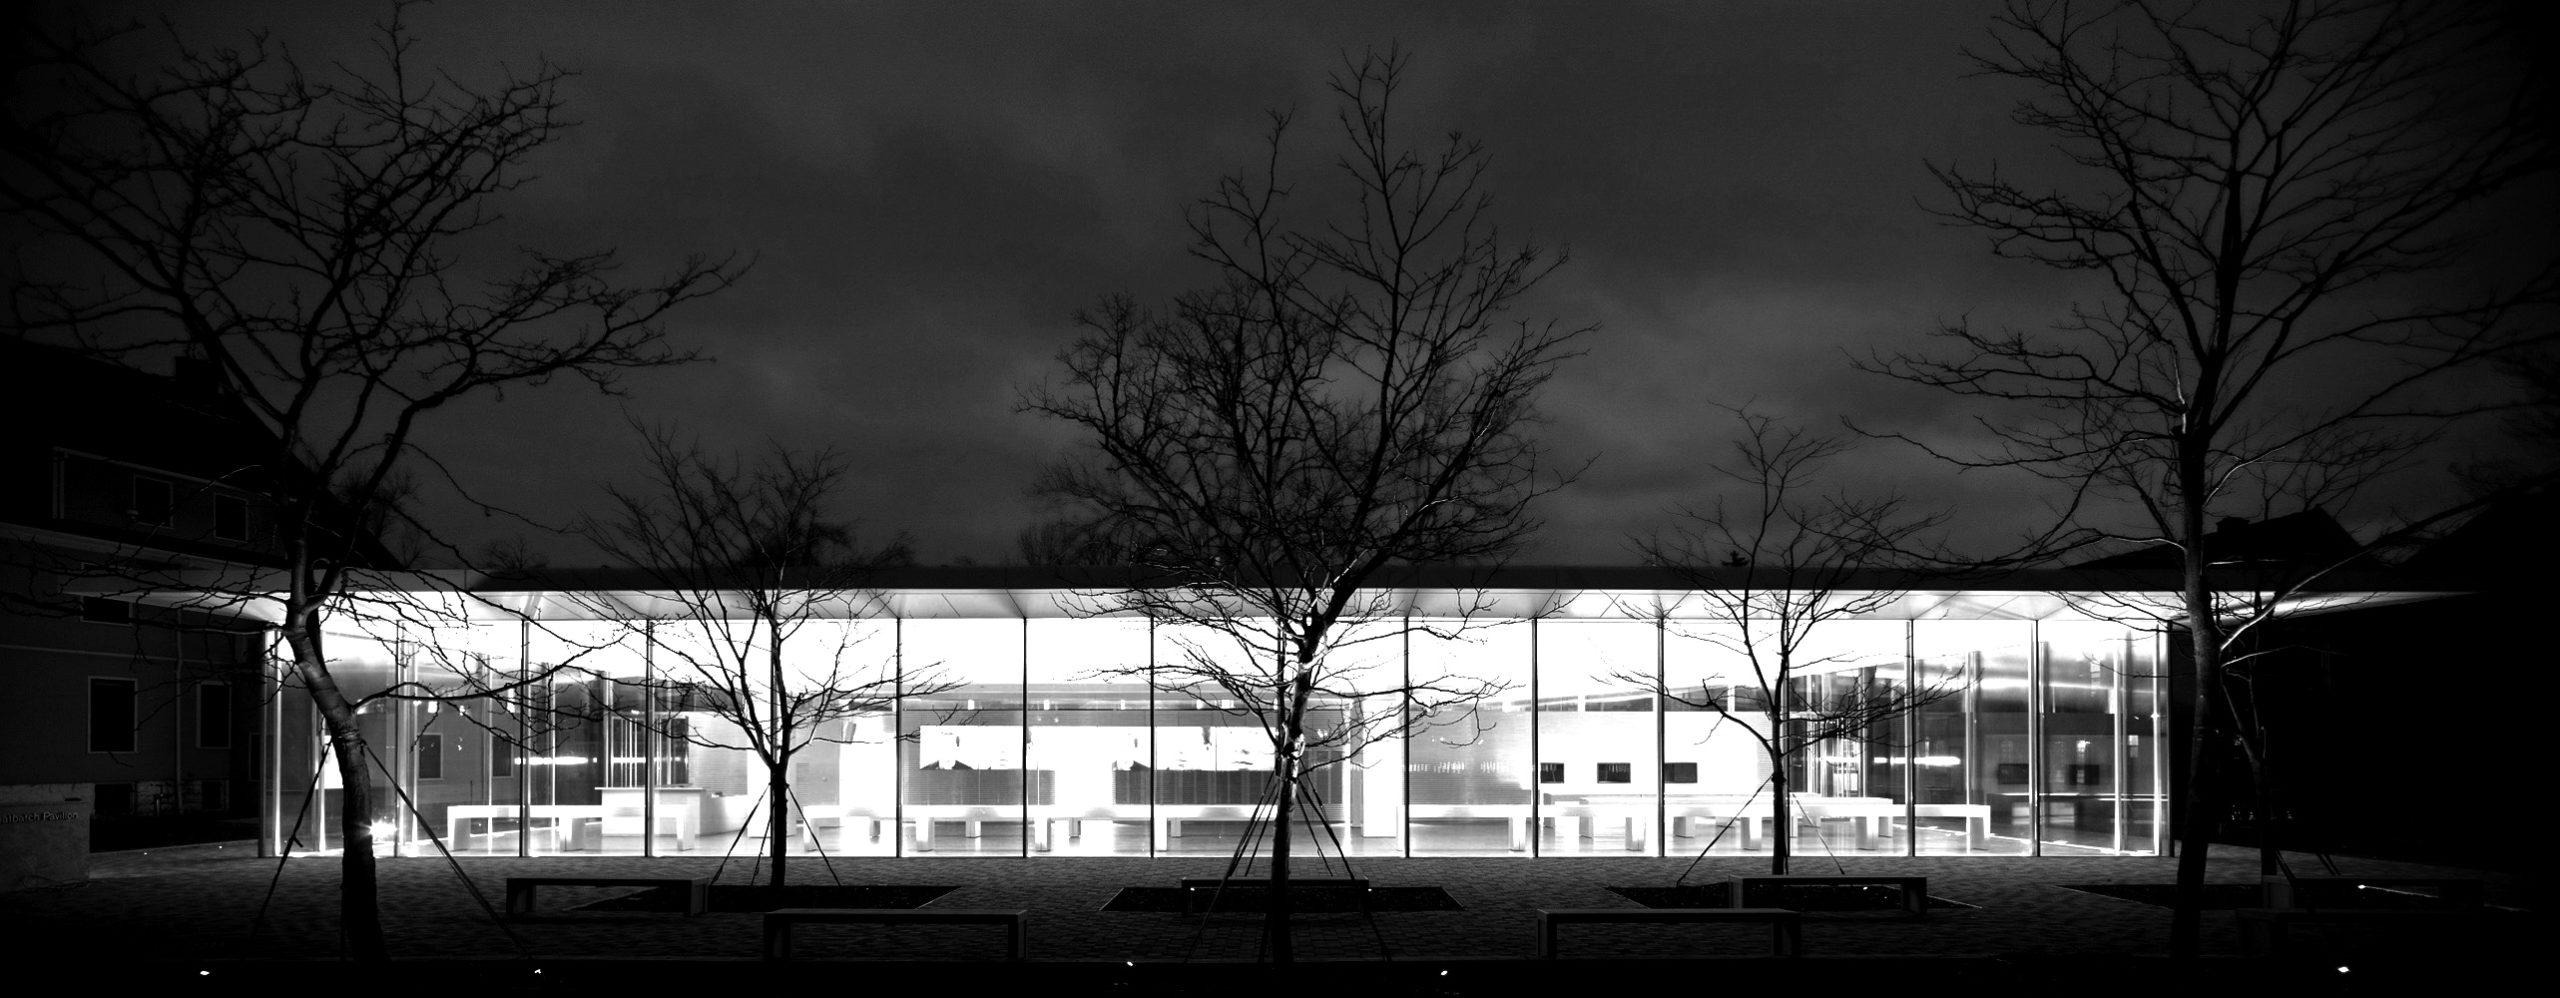 Frank Lloyd Wright Martin house's Greatbatch Pavilion, Toshiko Mori, 2009